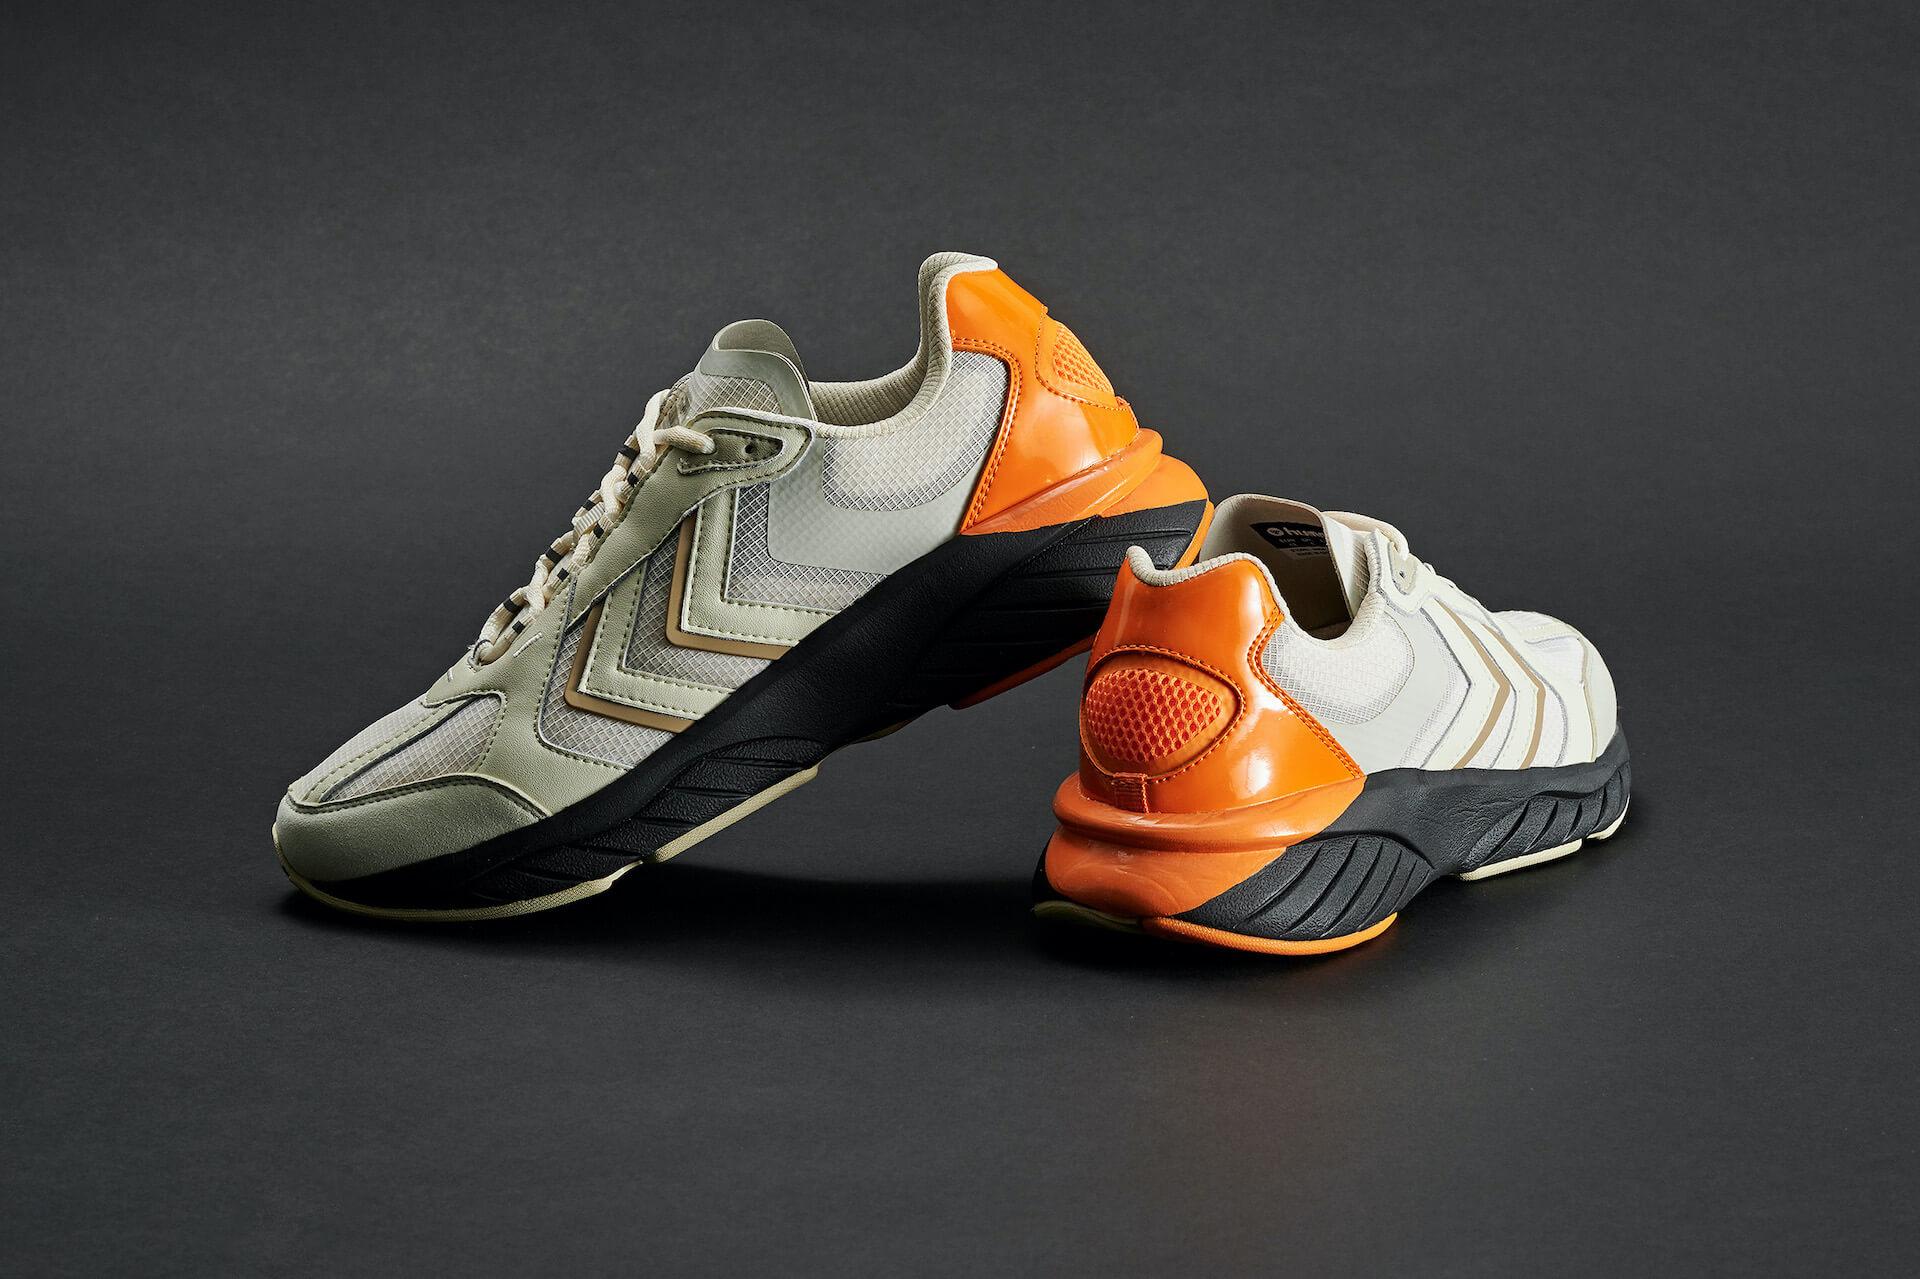 HUMMEL HIVEとASTRID ANDERSENのコラボスニーカーが東京・上野のmita sneakers限定で発売! lf200819_hummelhive_astritandersen_06